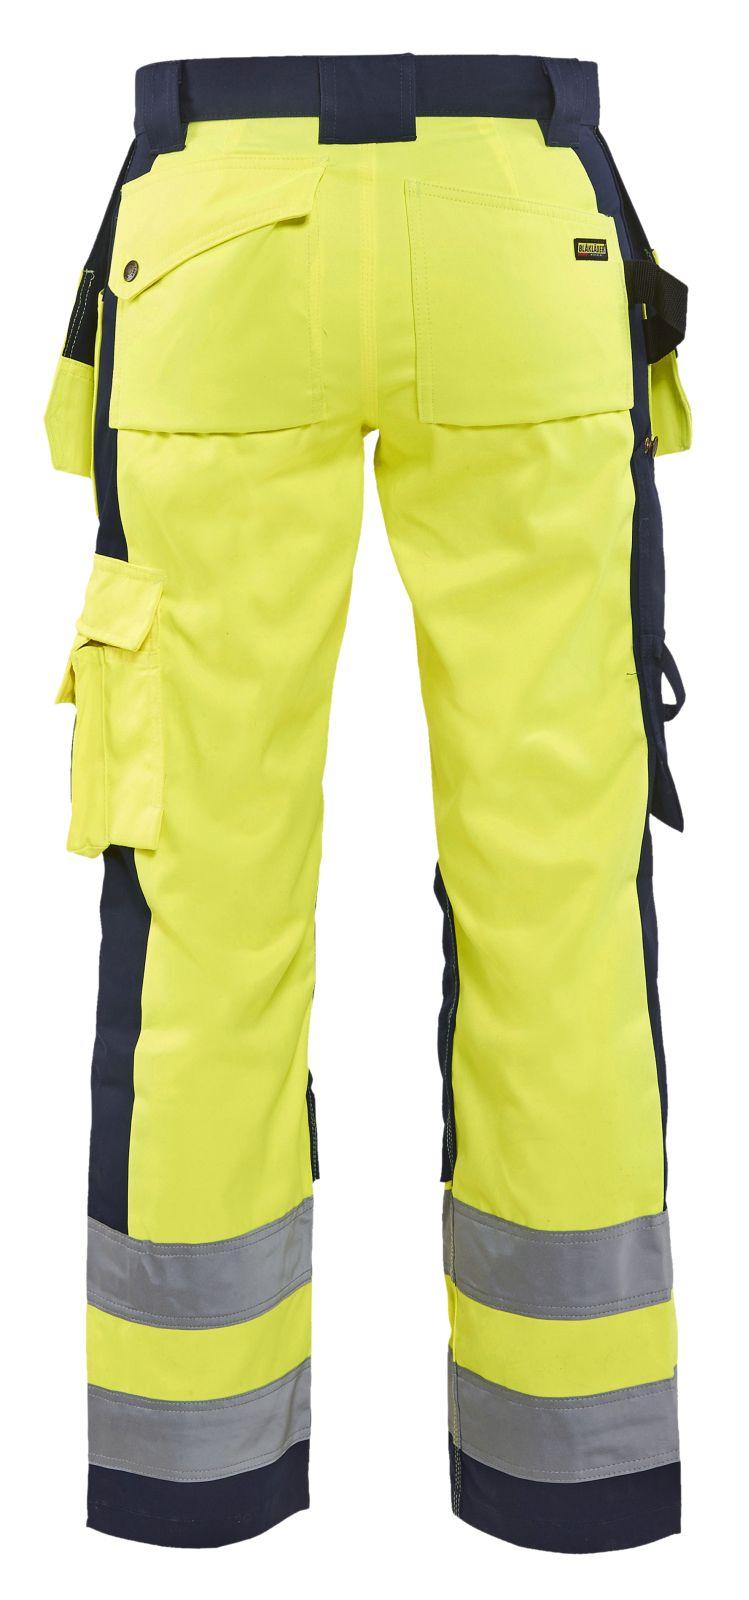 Blaklader Dames werkbroeken 15431804 High Vis geel-marineblauw(3389)